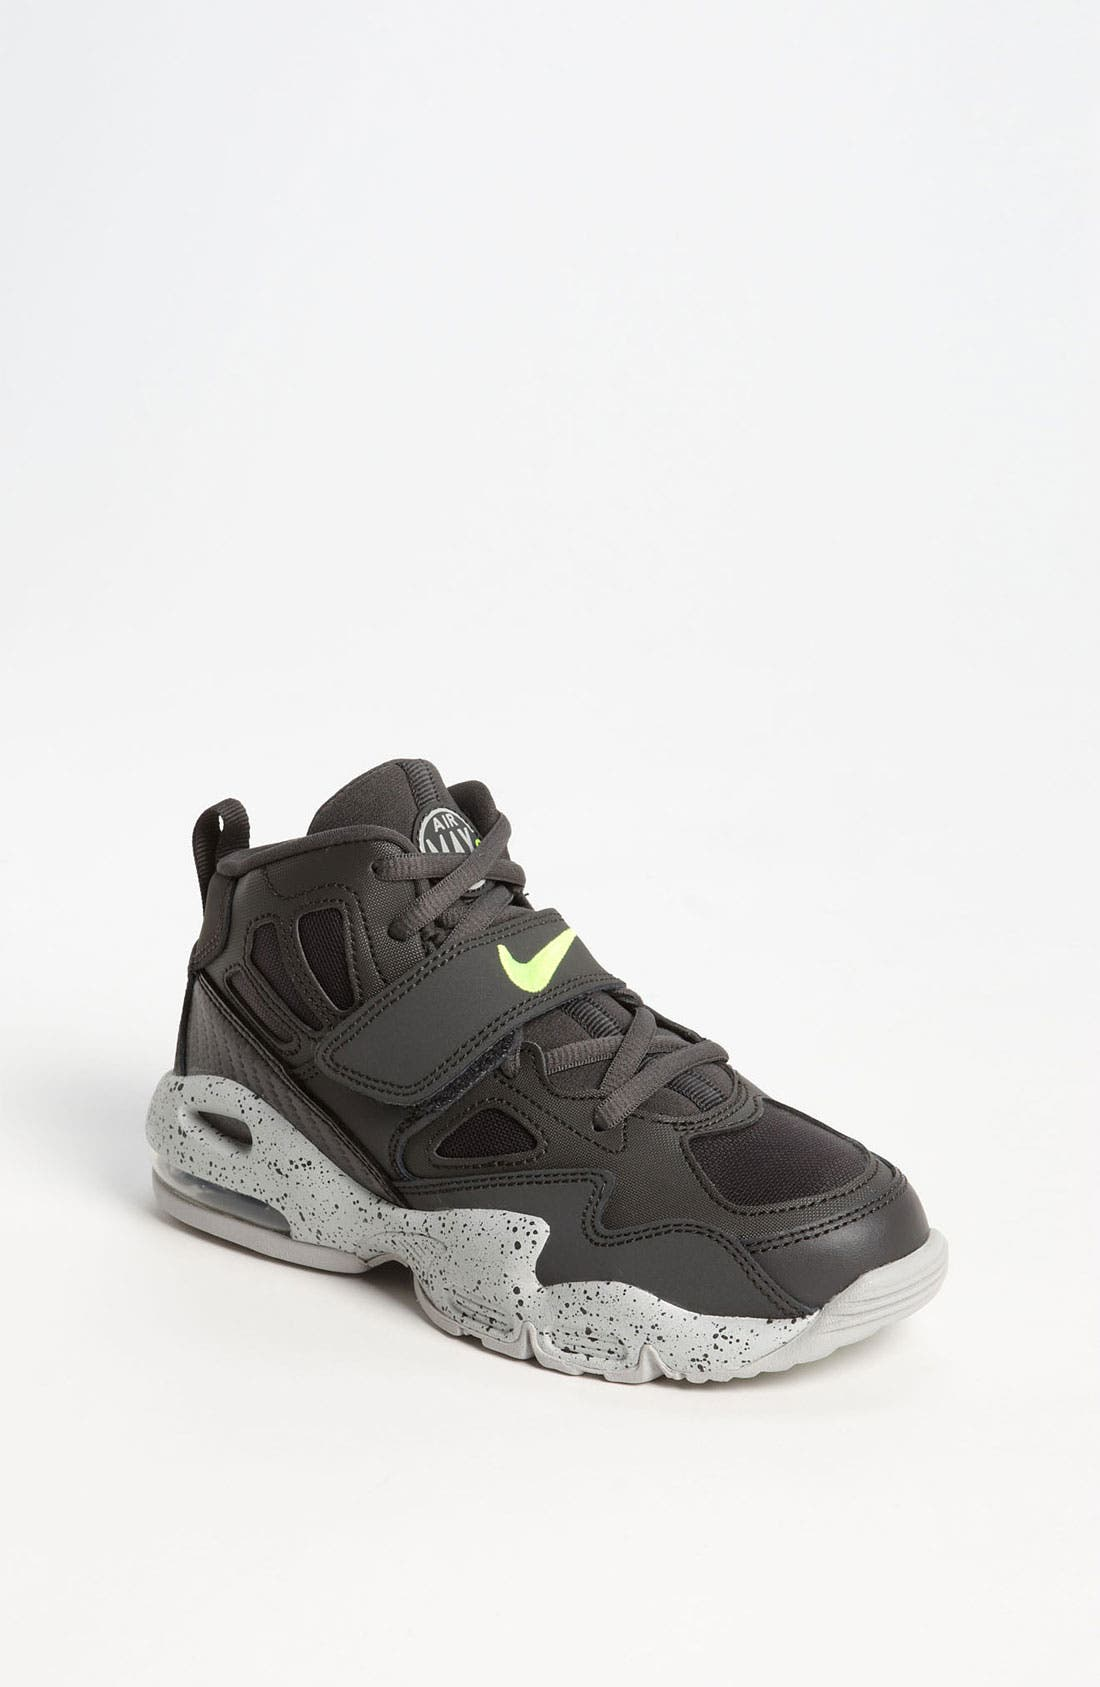 Main Image - Nike 'Air Max Express' Sneaker (Toddler, Little Kid & Big Kid)